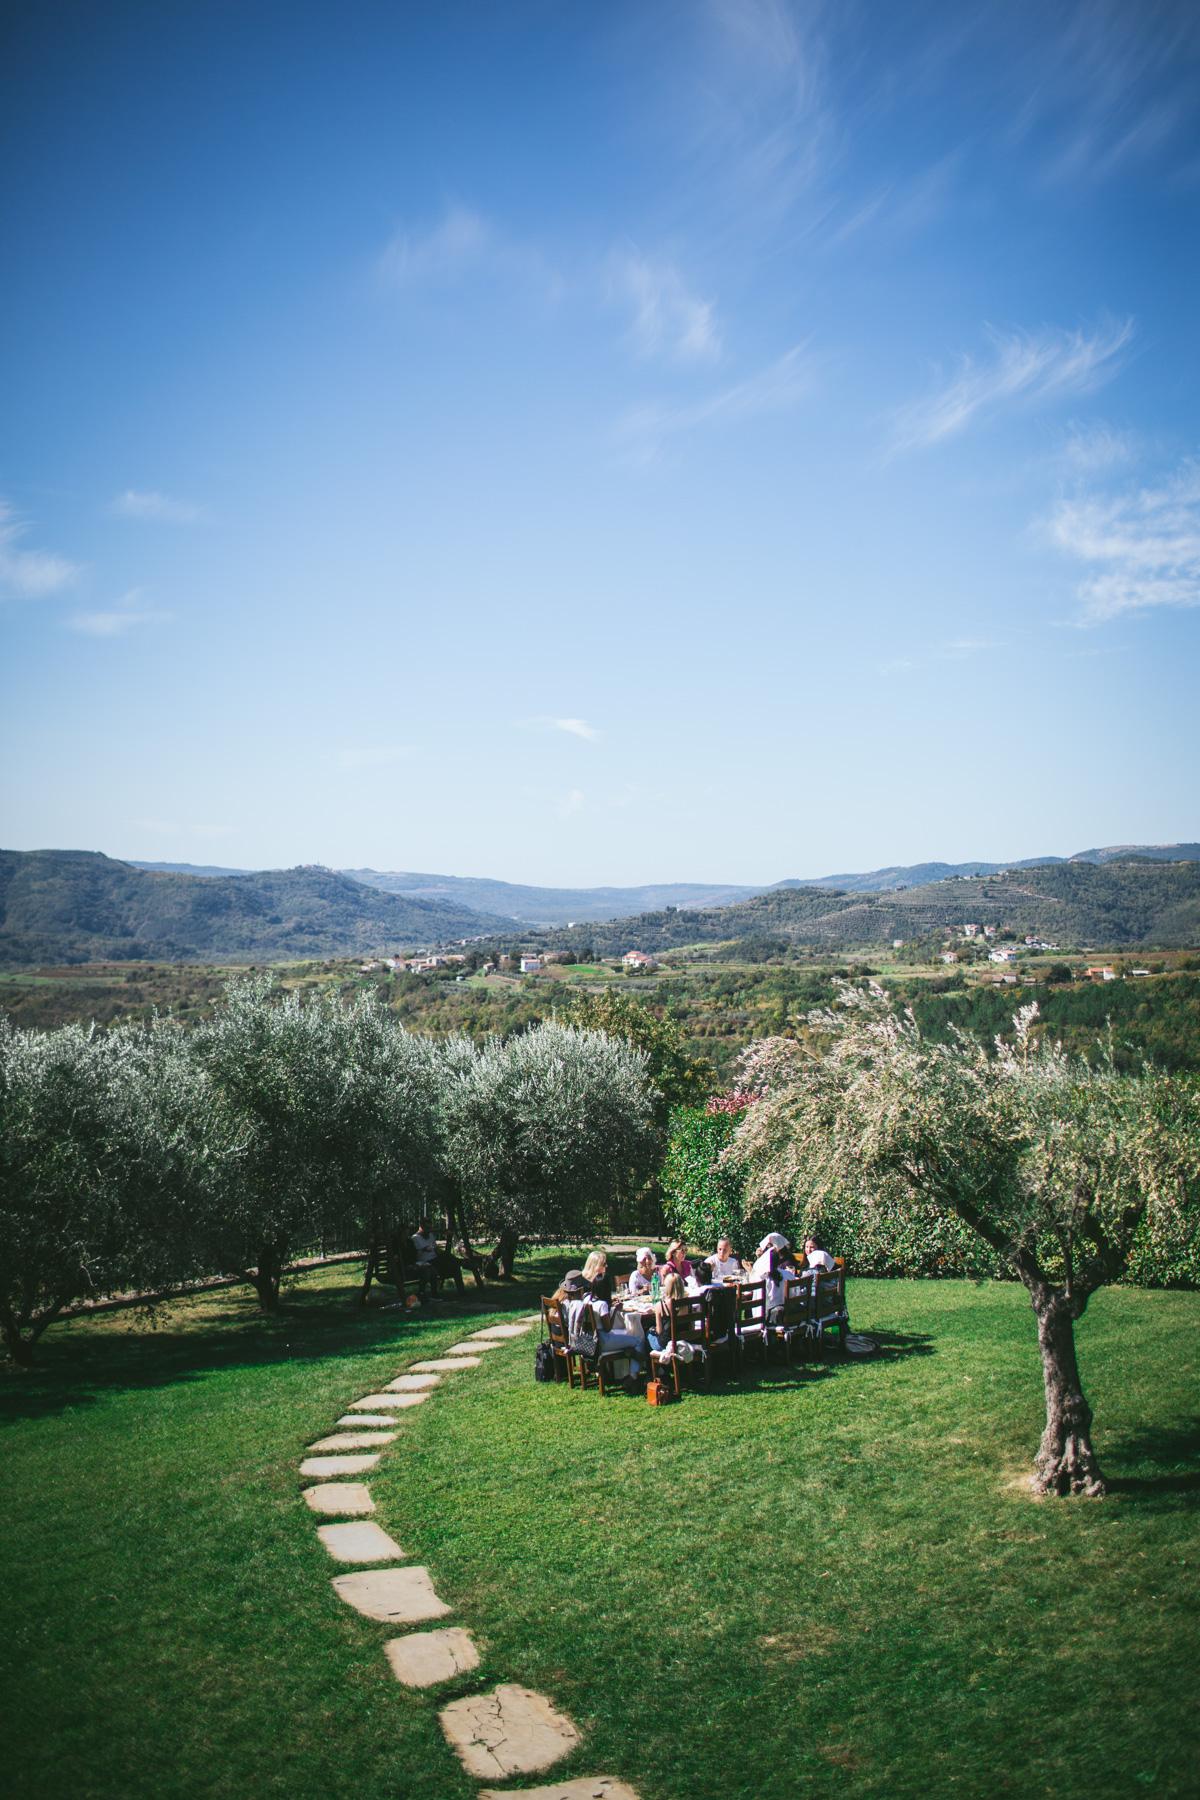 croatia photography workshop with eva kosmas flores-42.jpeg